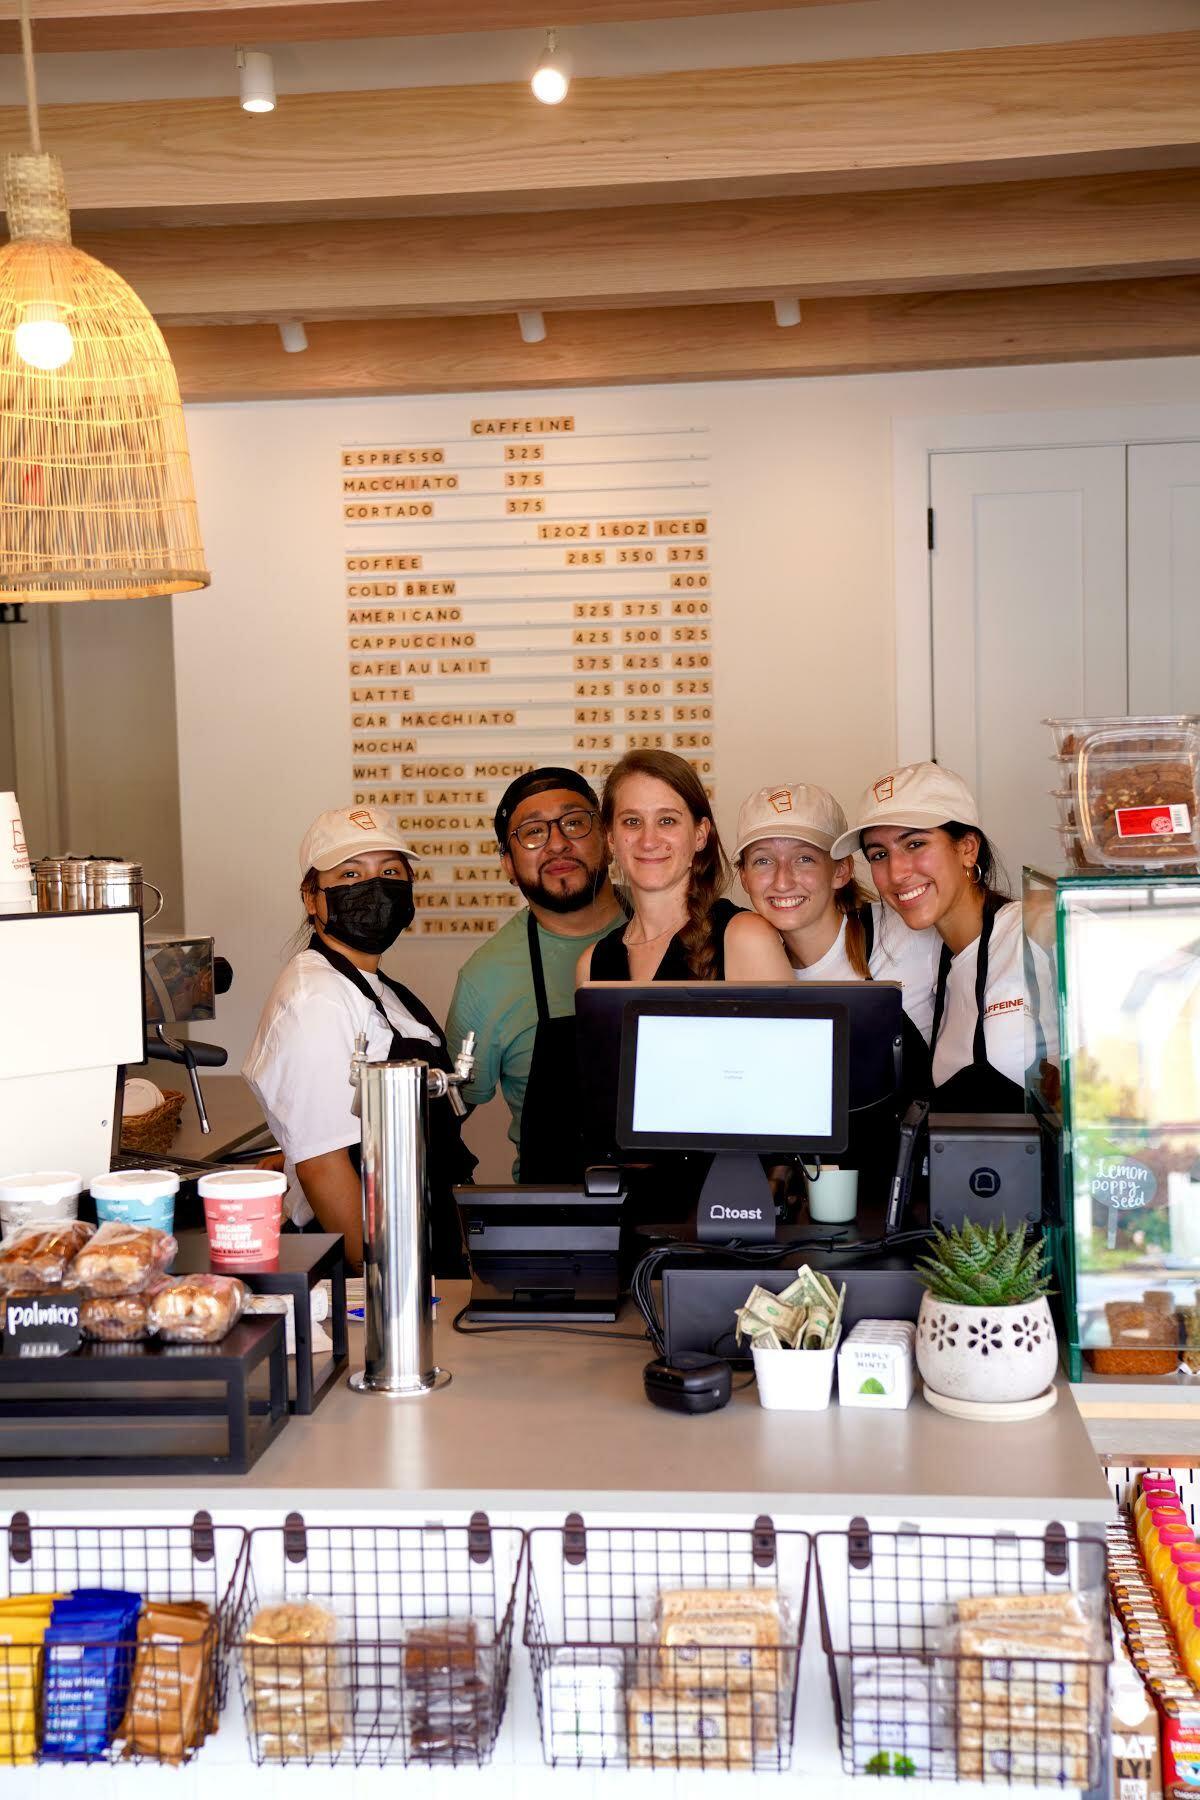 Caffeine Westhampton opened on July 12th.